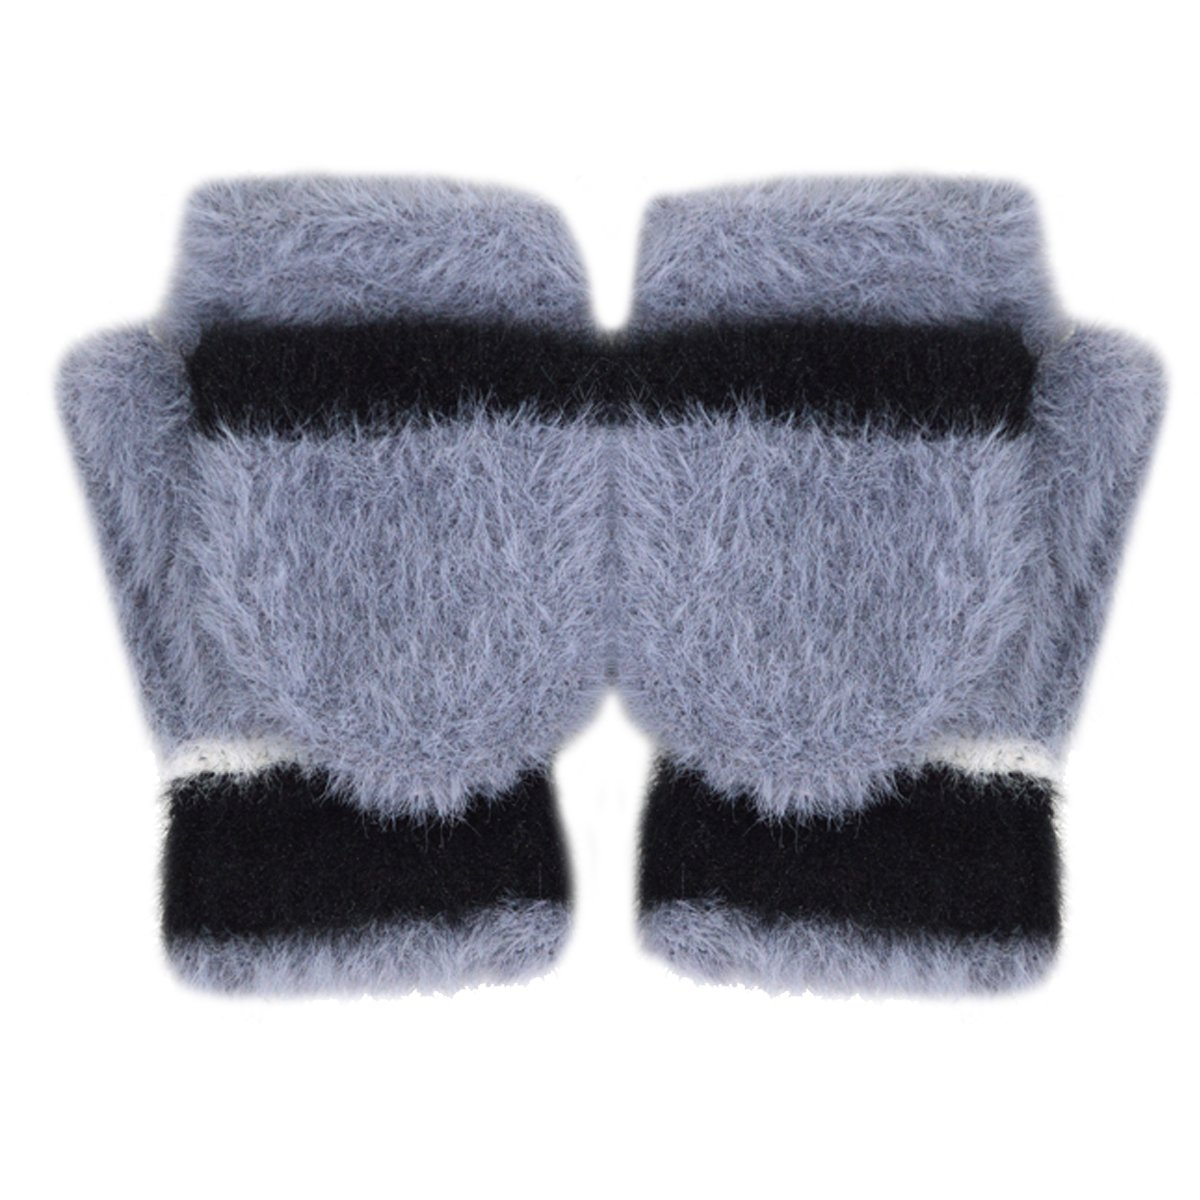 Women Cute Half Finger Gloves Flip Top Convertible Mittens Plush Faux Fur Mitts(Grey)